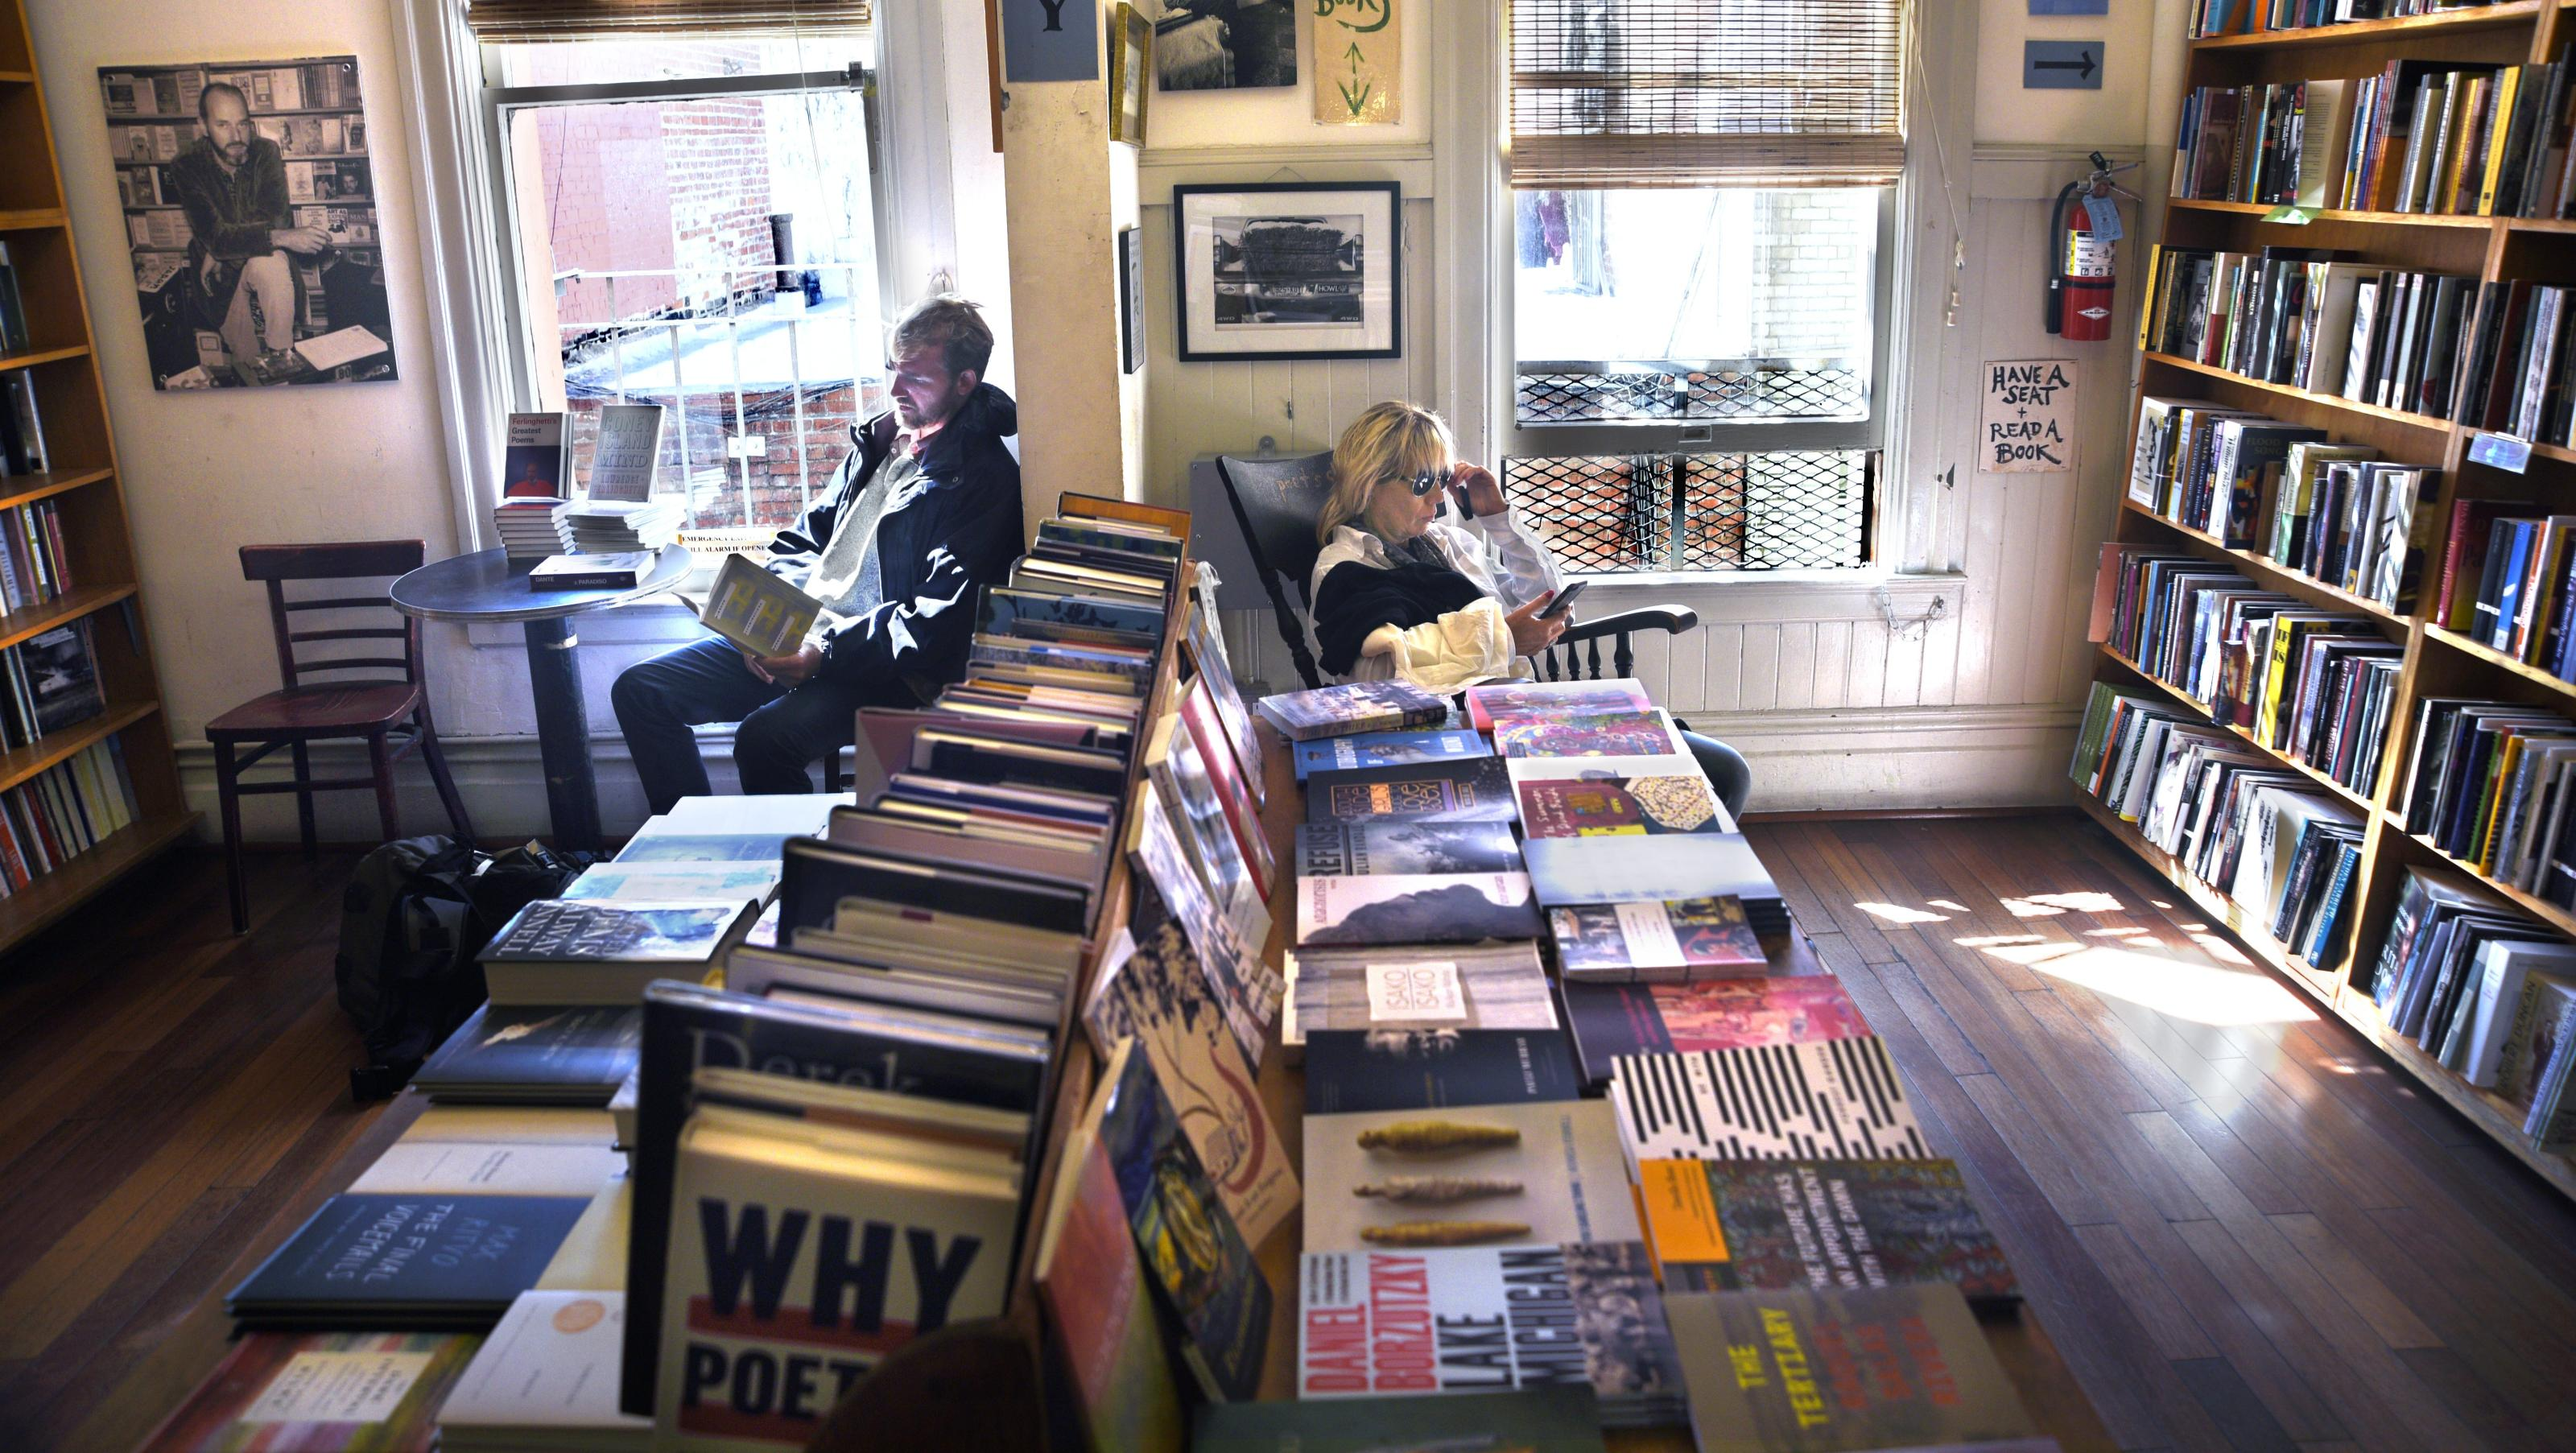 James Patterson bestows holiday bonuses upon indie booksellers